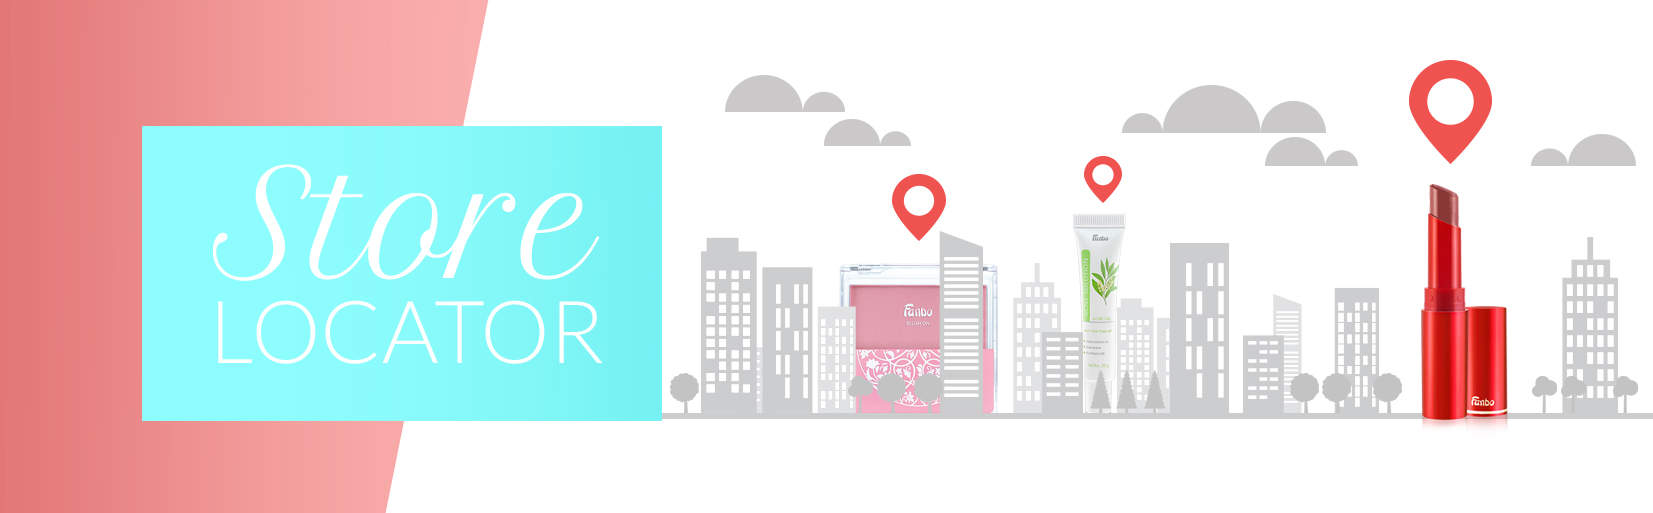 Banner Store Locator